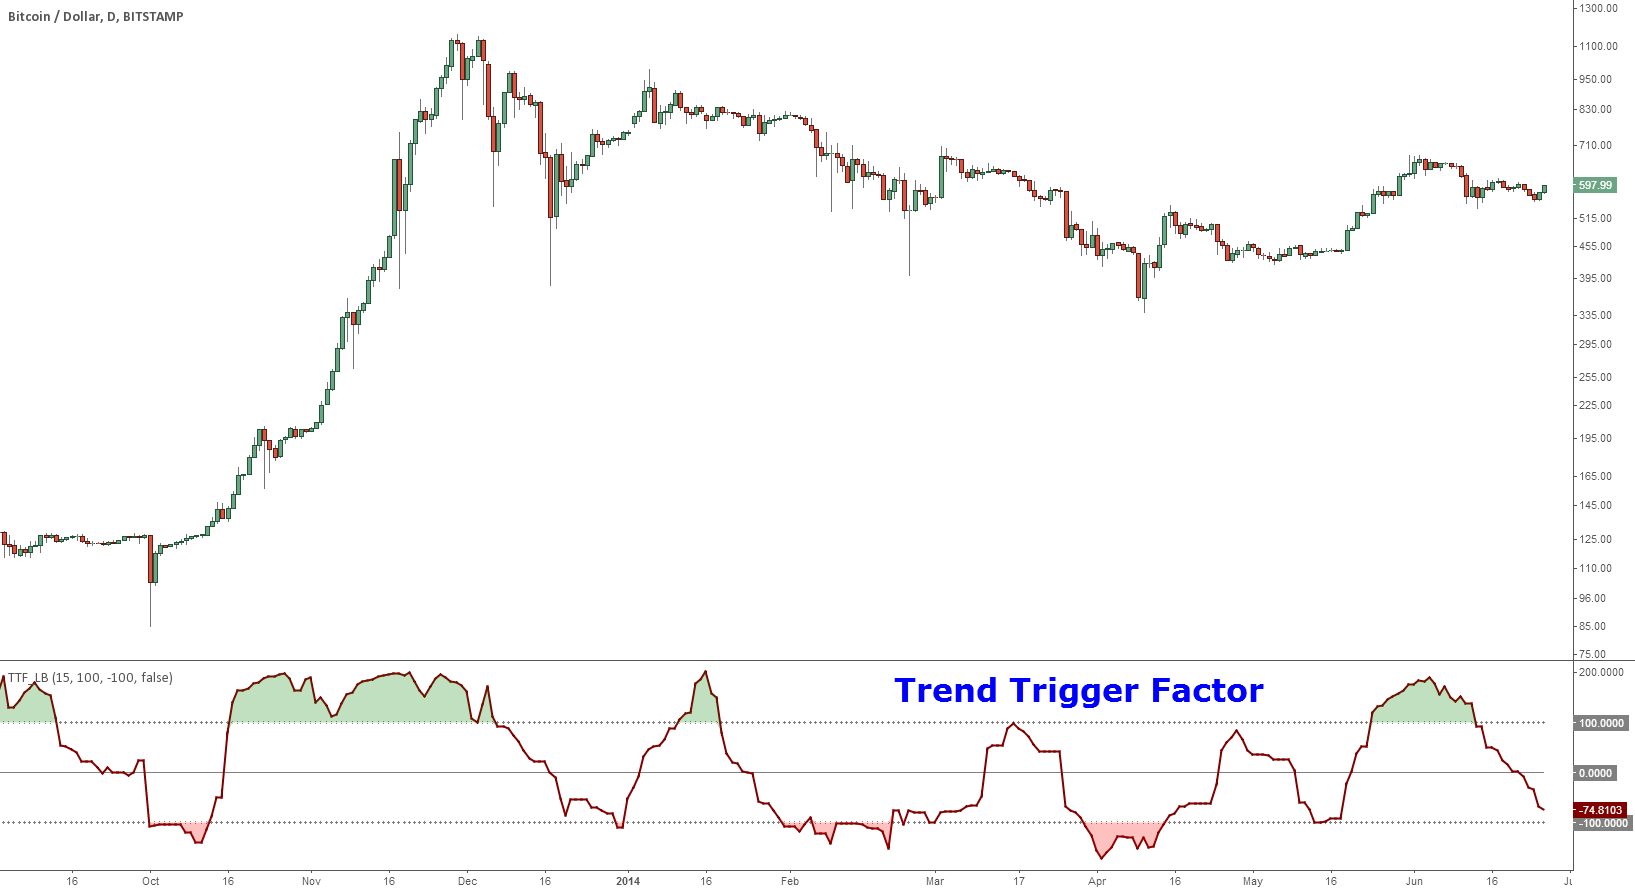 Indicator: Trend Trigger Factor